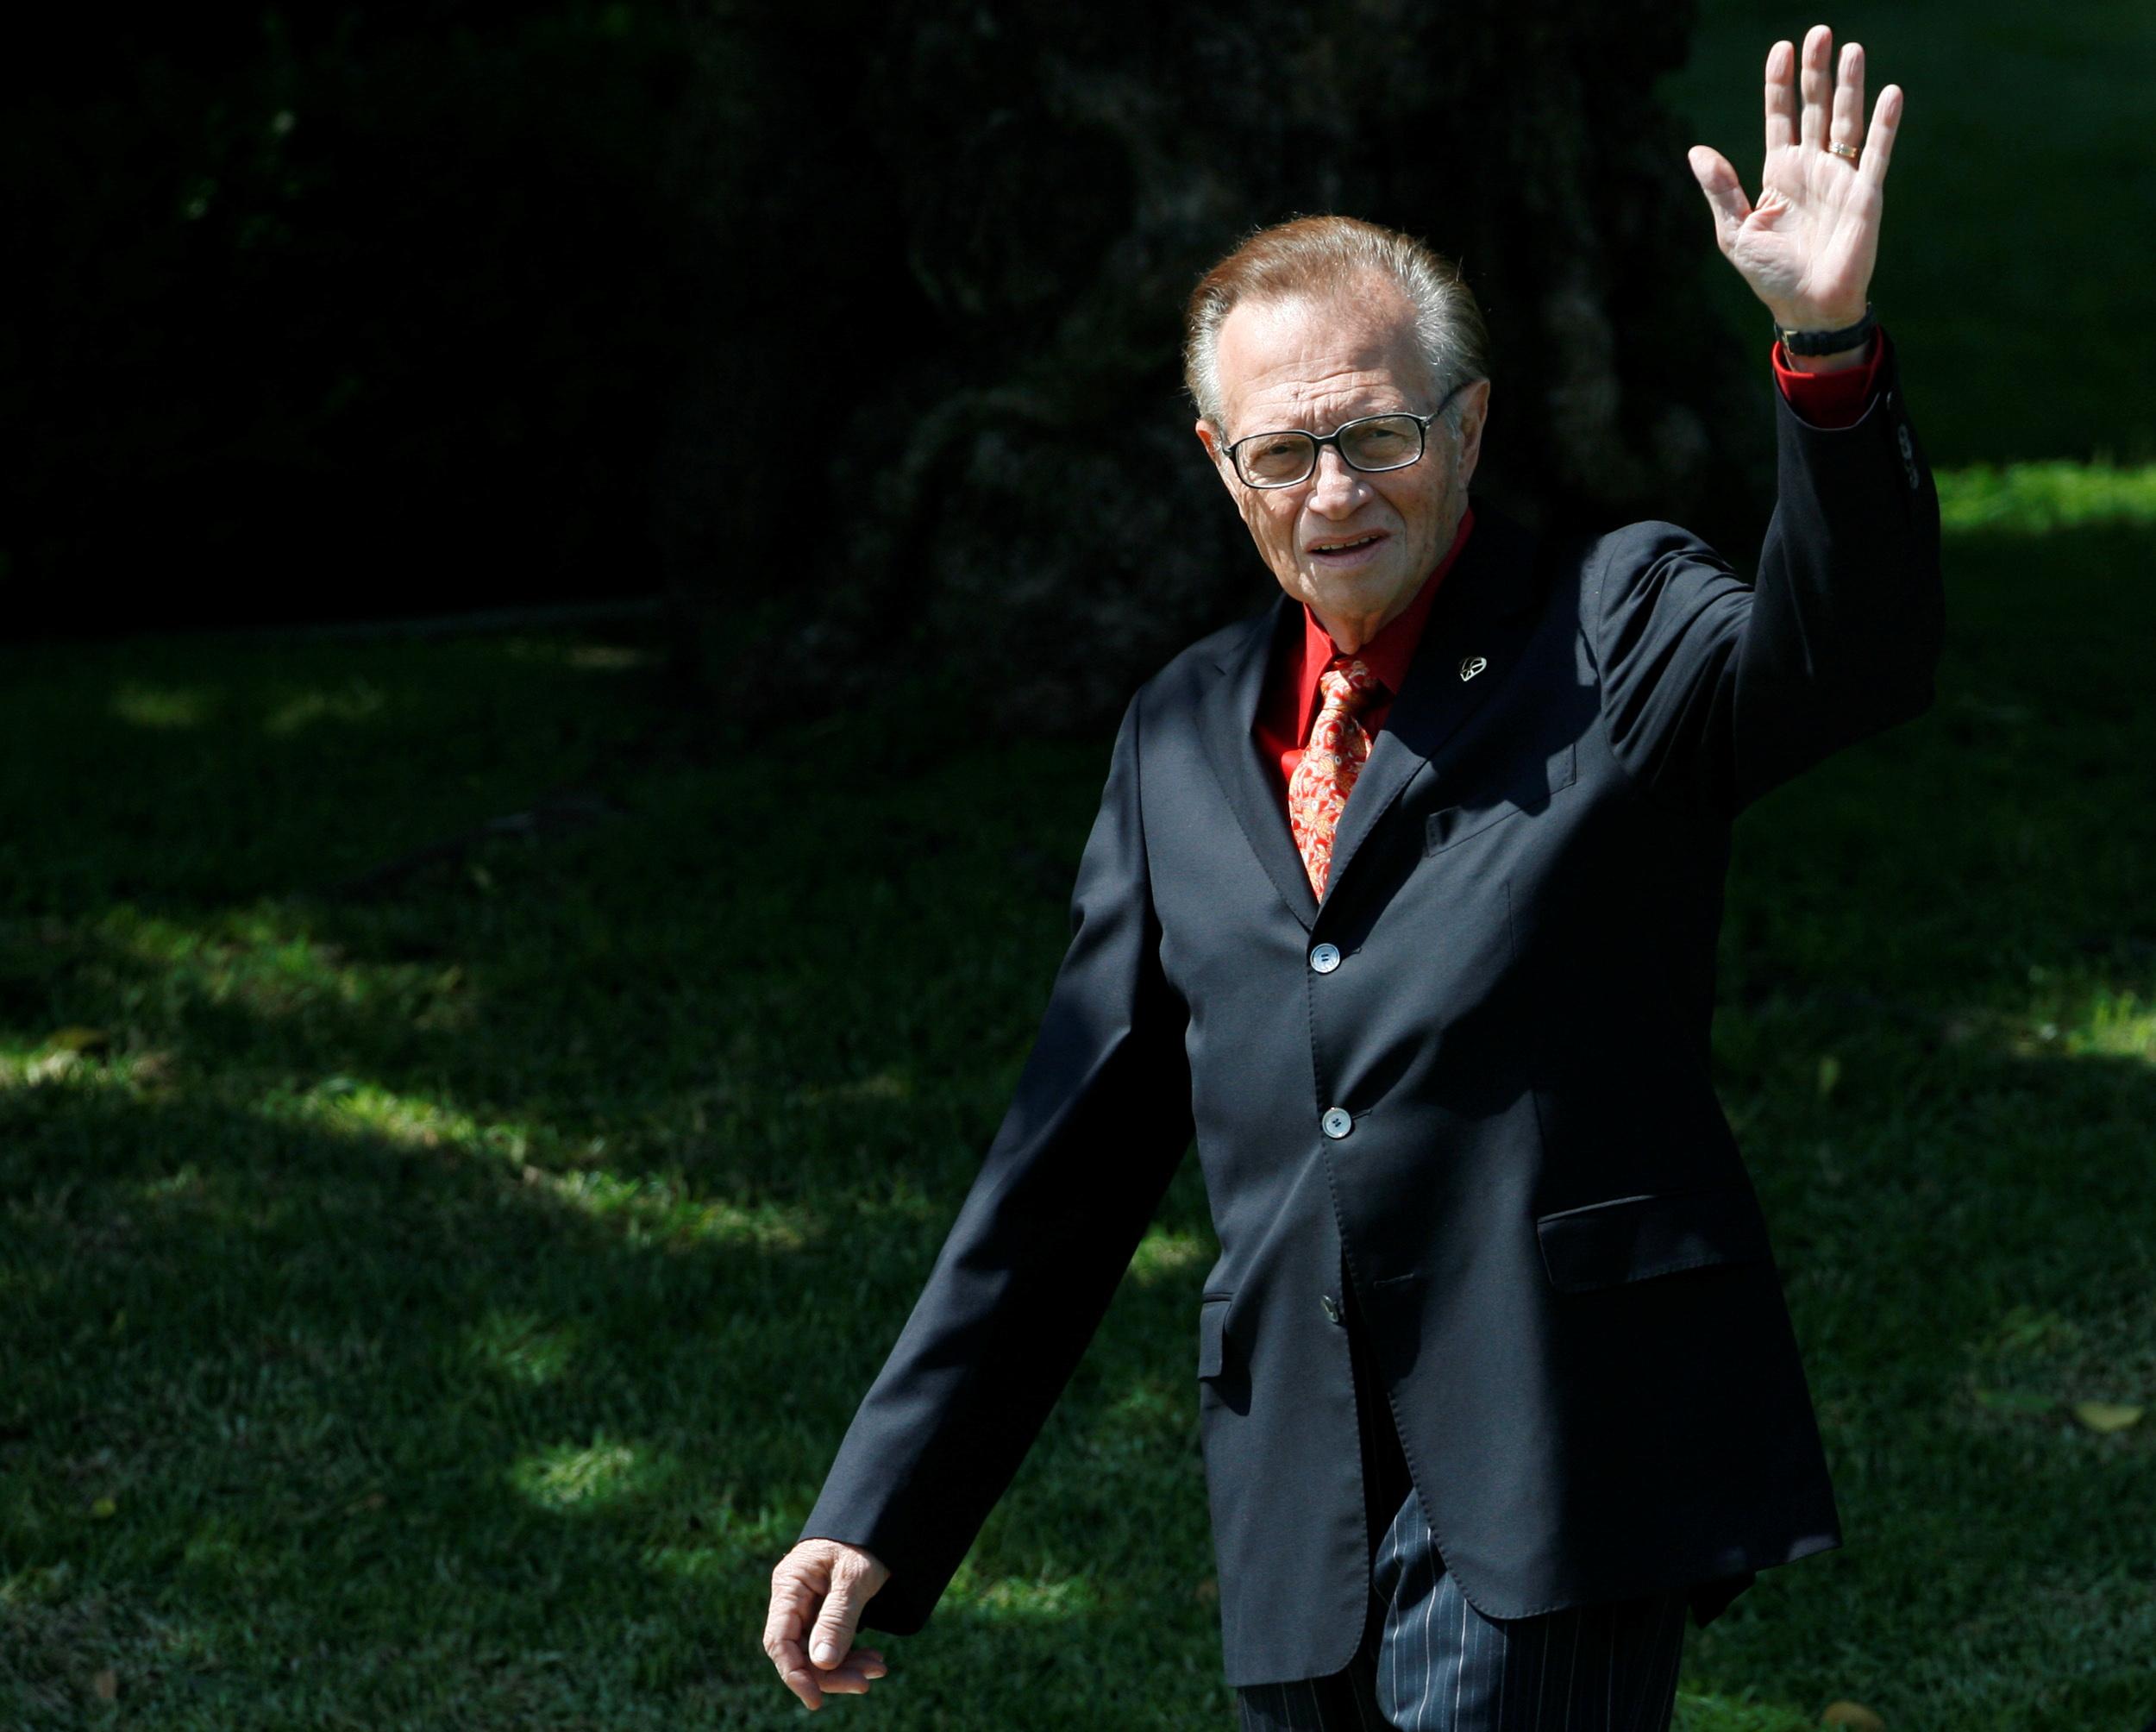 Larry King: Σίγησε το μικρόφωνο του «γίγαντα» των talk show